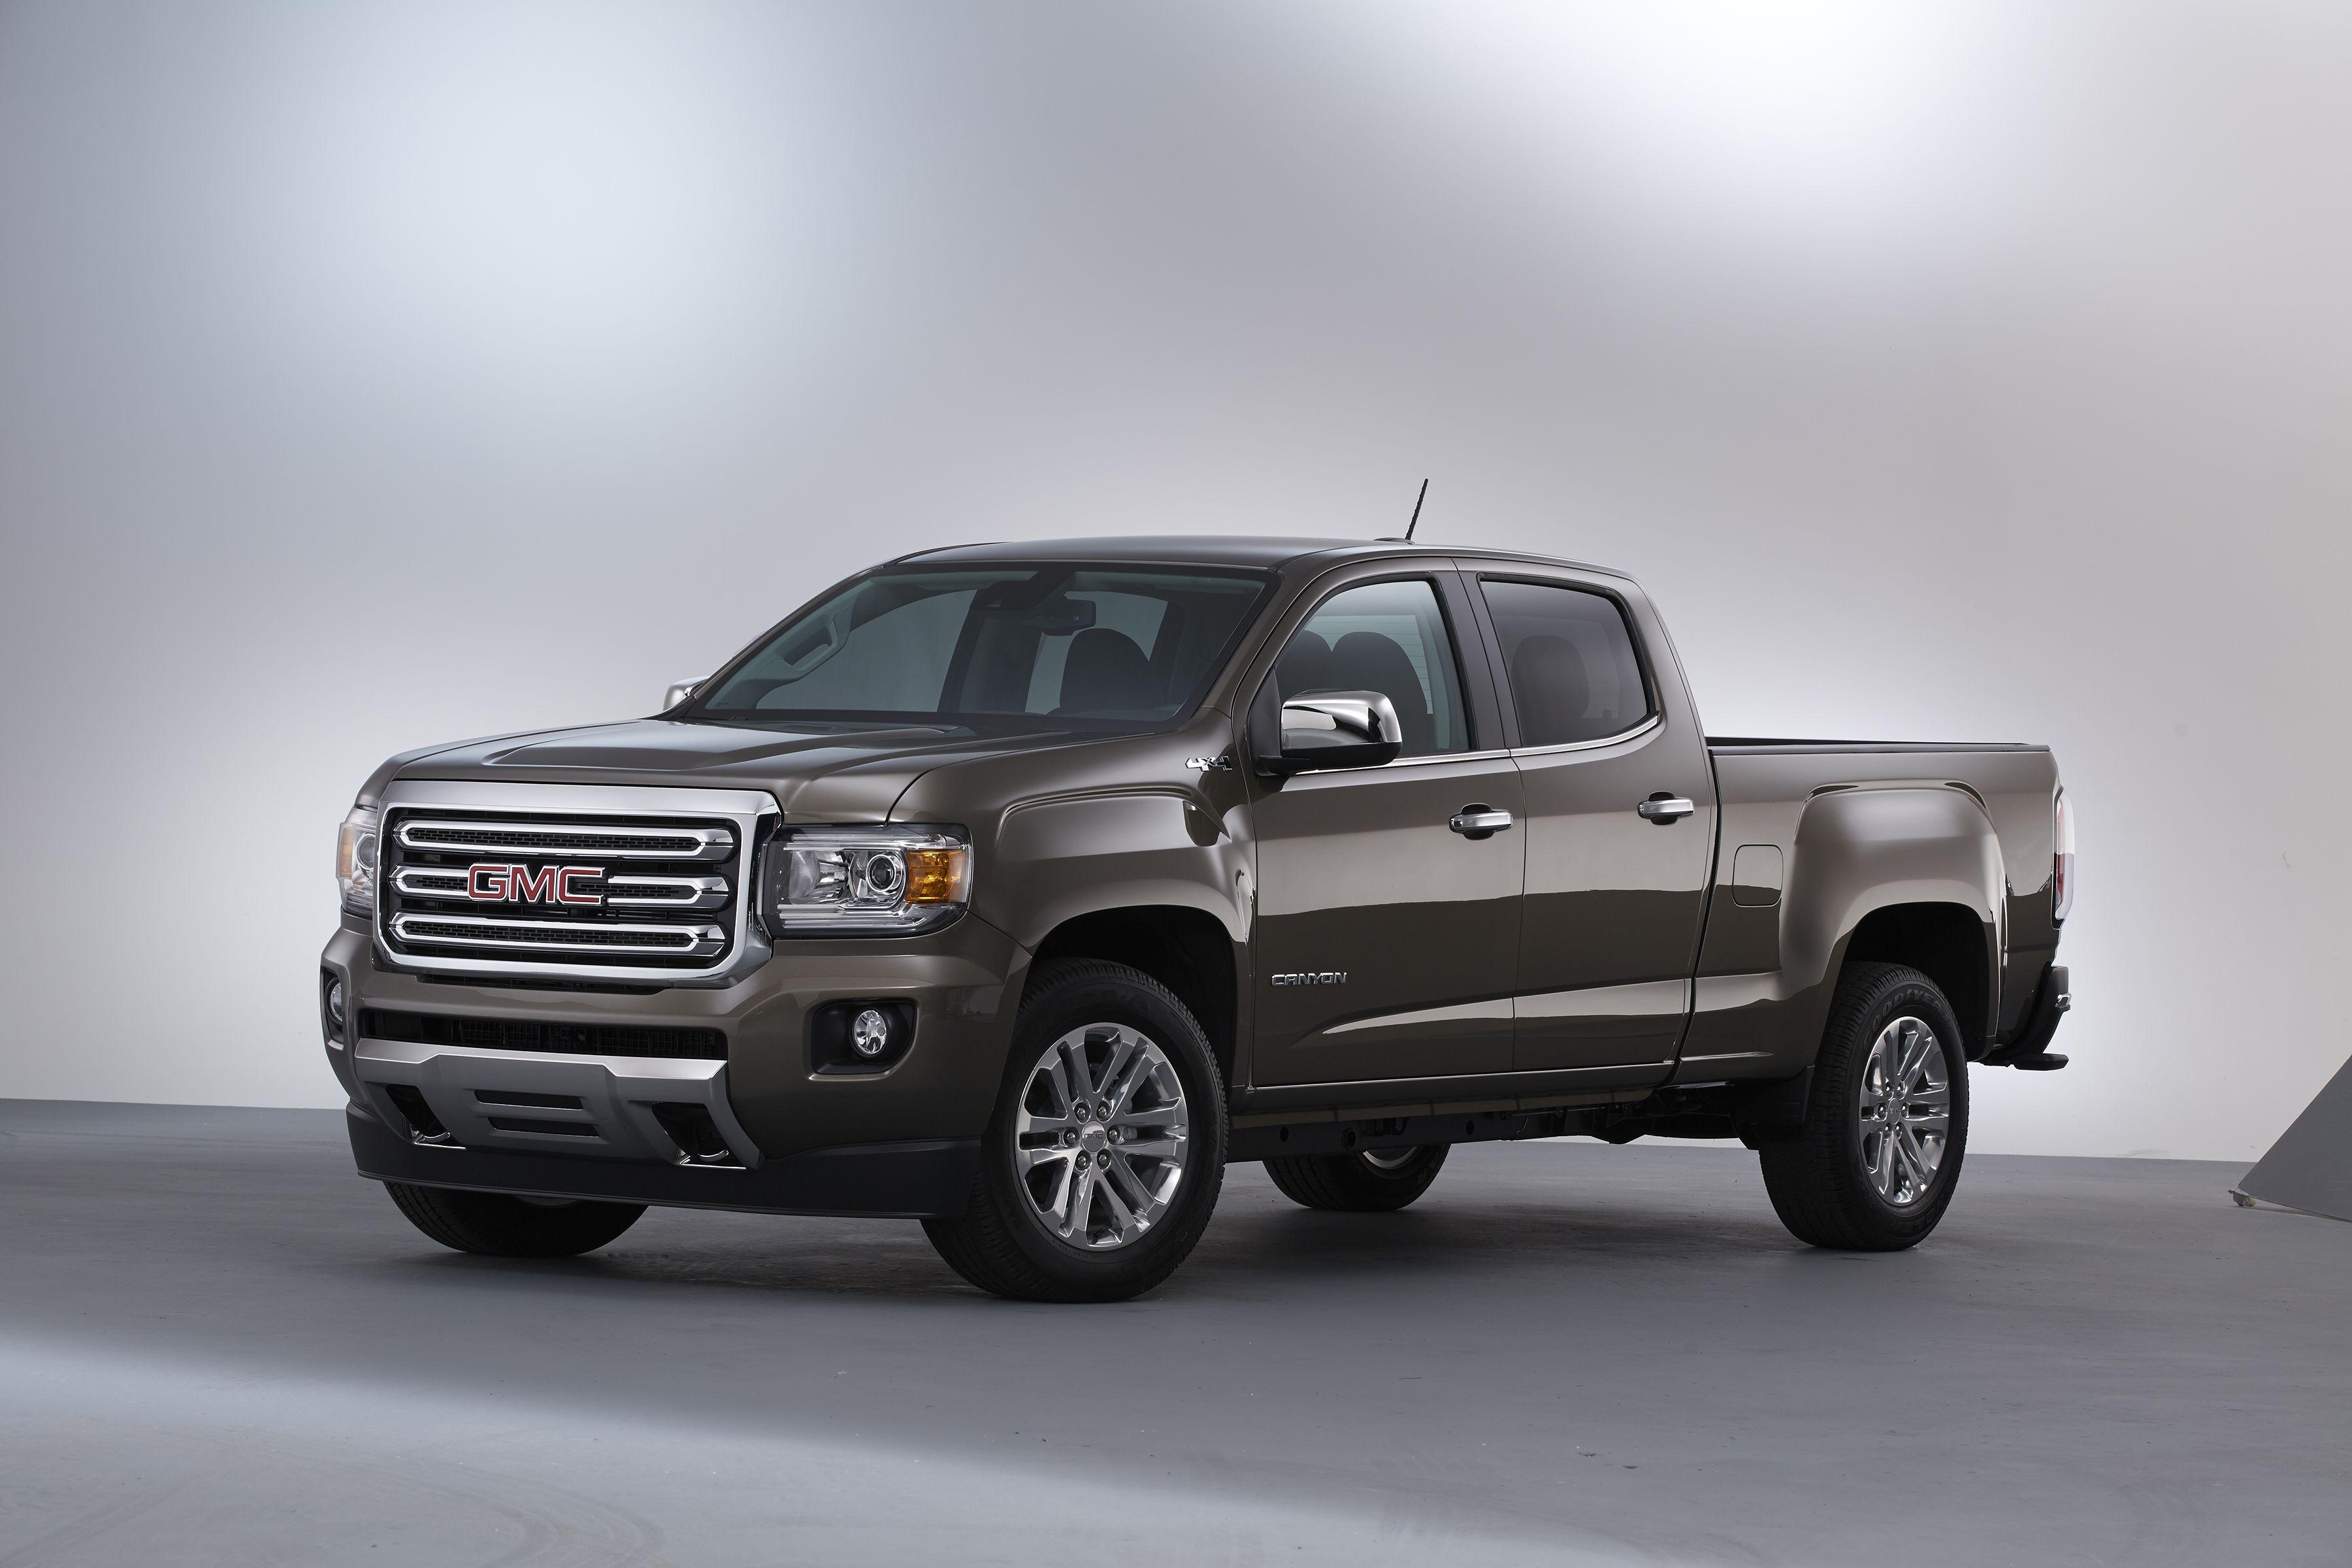 kid releases rock gmc sierra custom ridge built truck htm receives rocky pickup